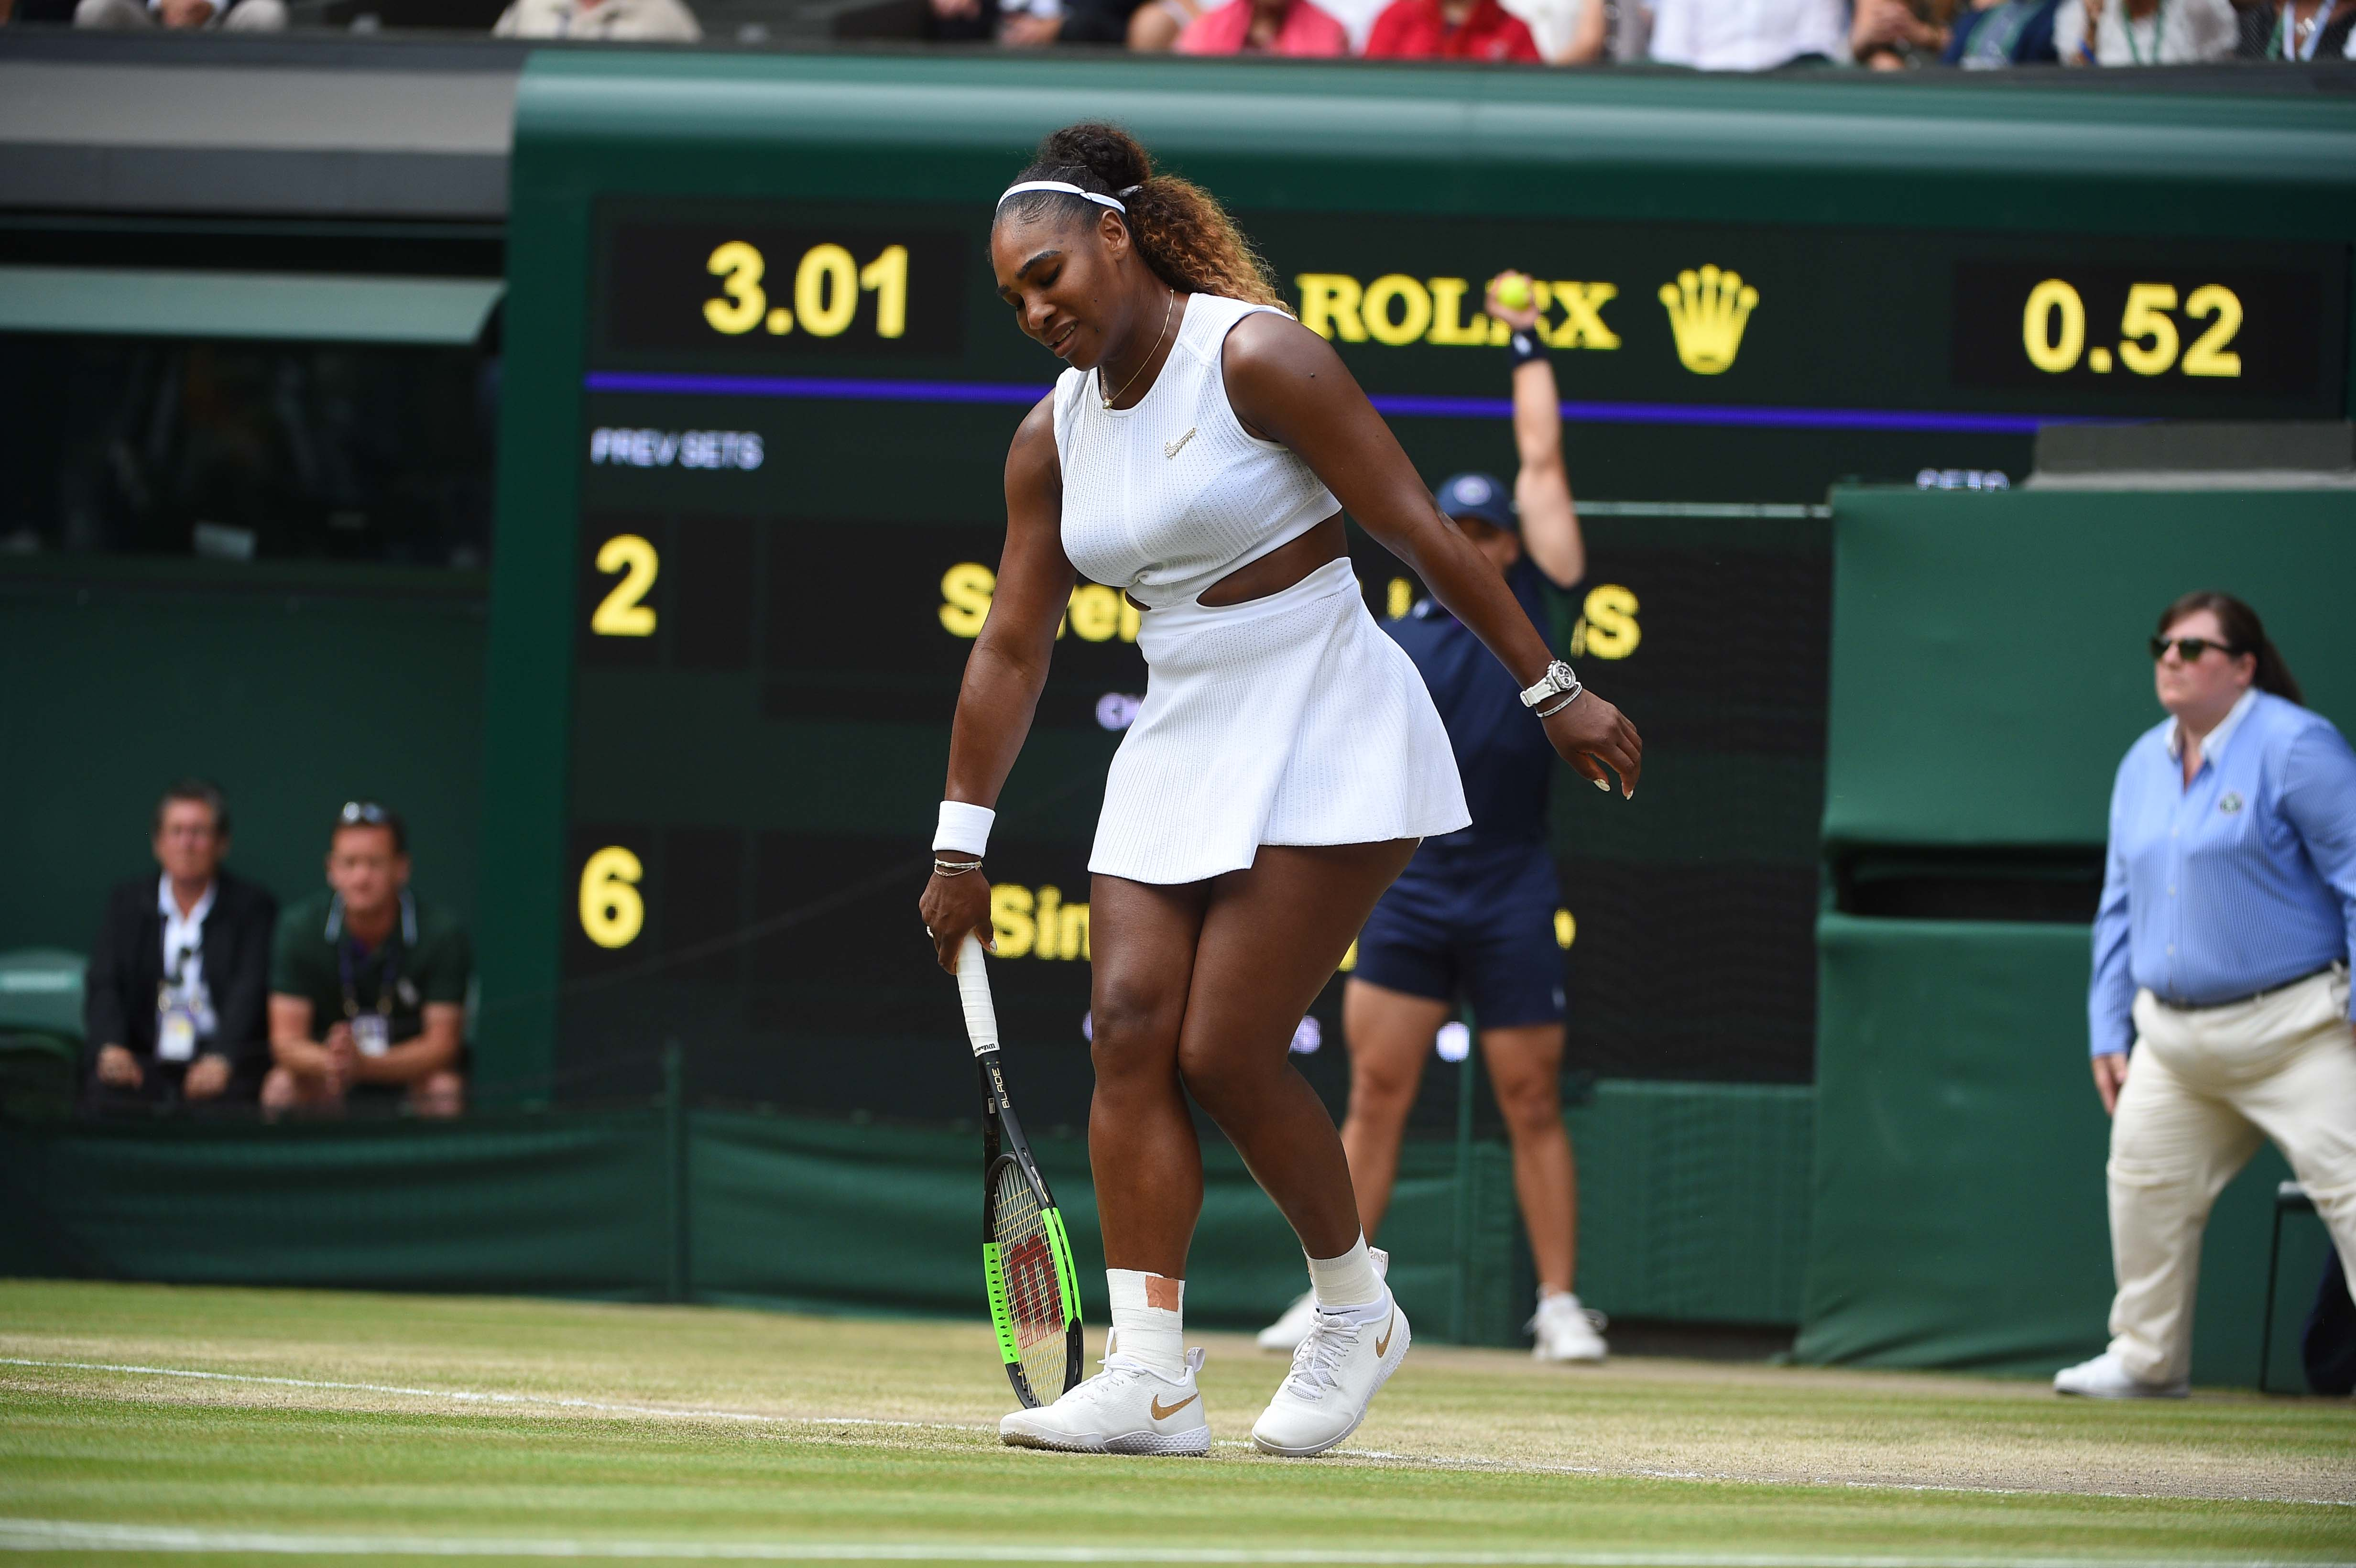 Disconcerted Serena Williams at Wimbledon 2019